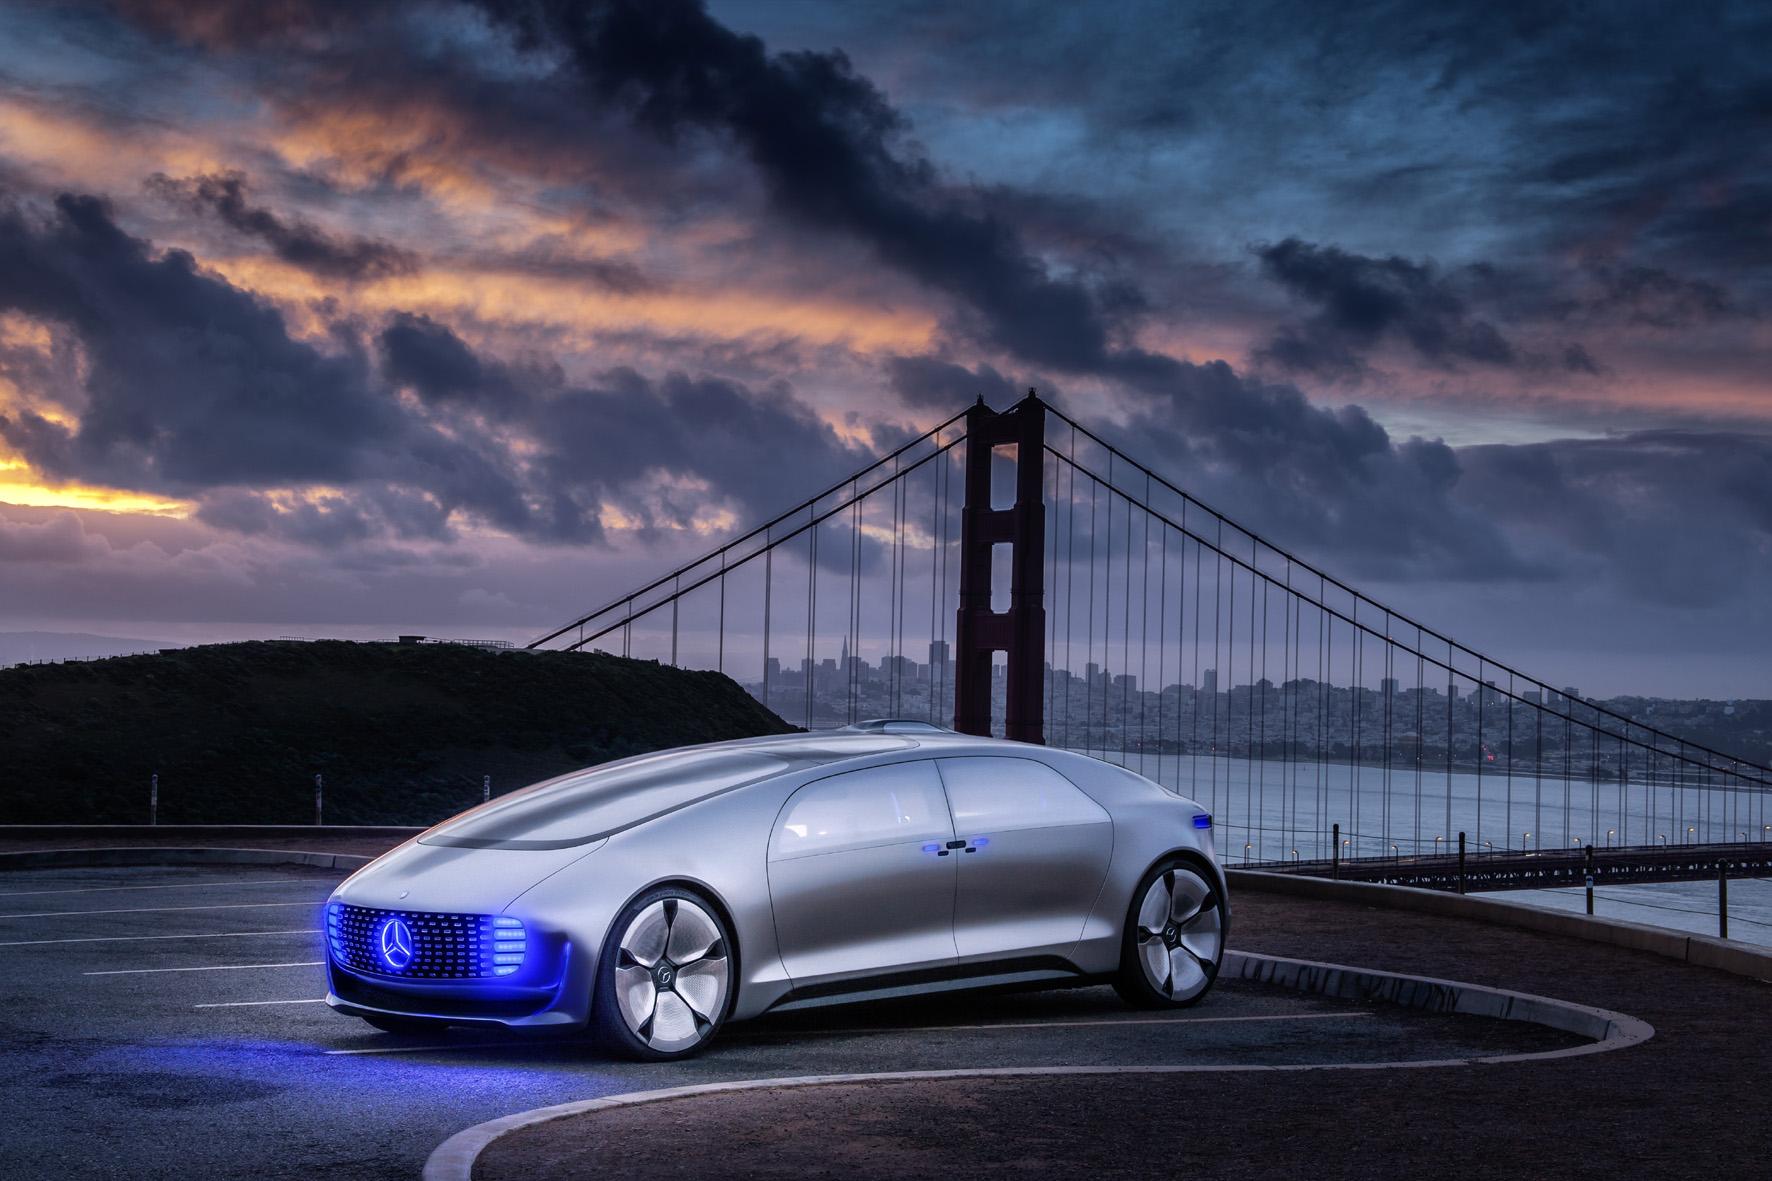 Mercedes: Vollgas beim autonomen Fahren